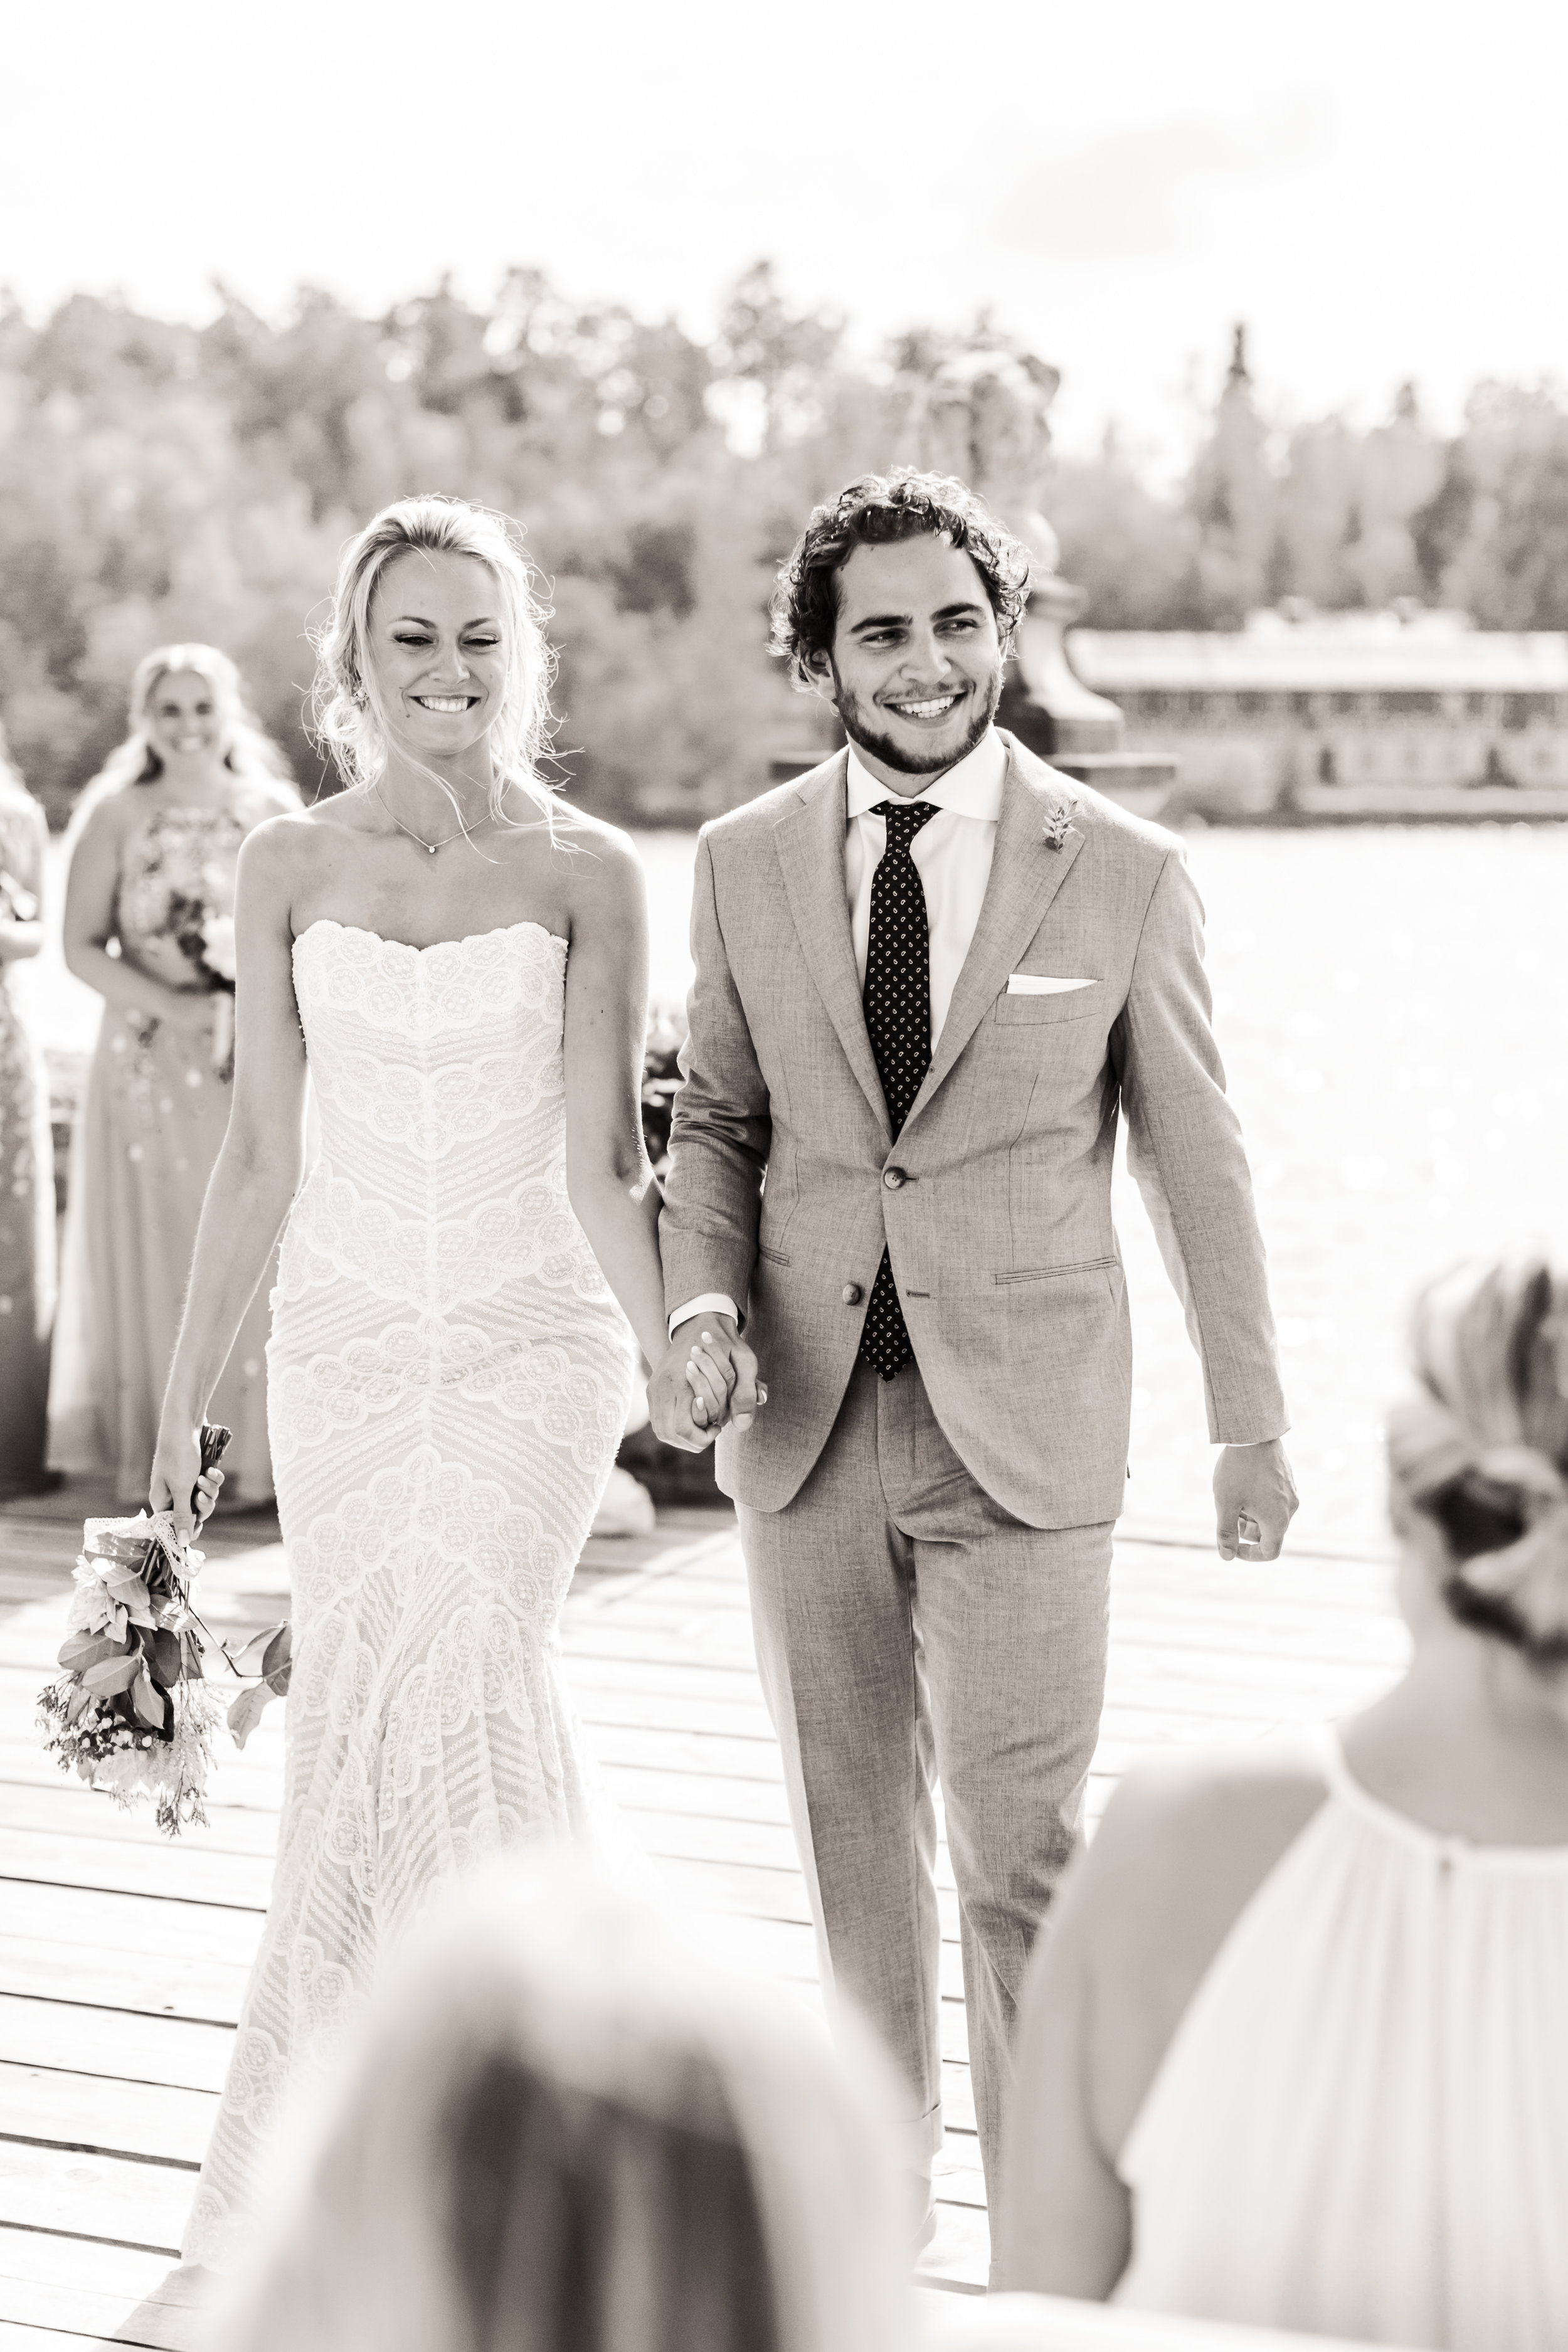 Bröllop_Fredriksborgshotell_Värmdö_0055.jpg